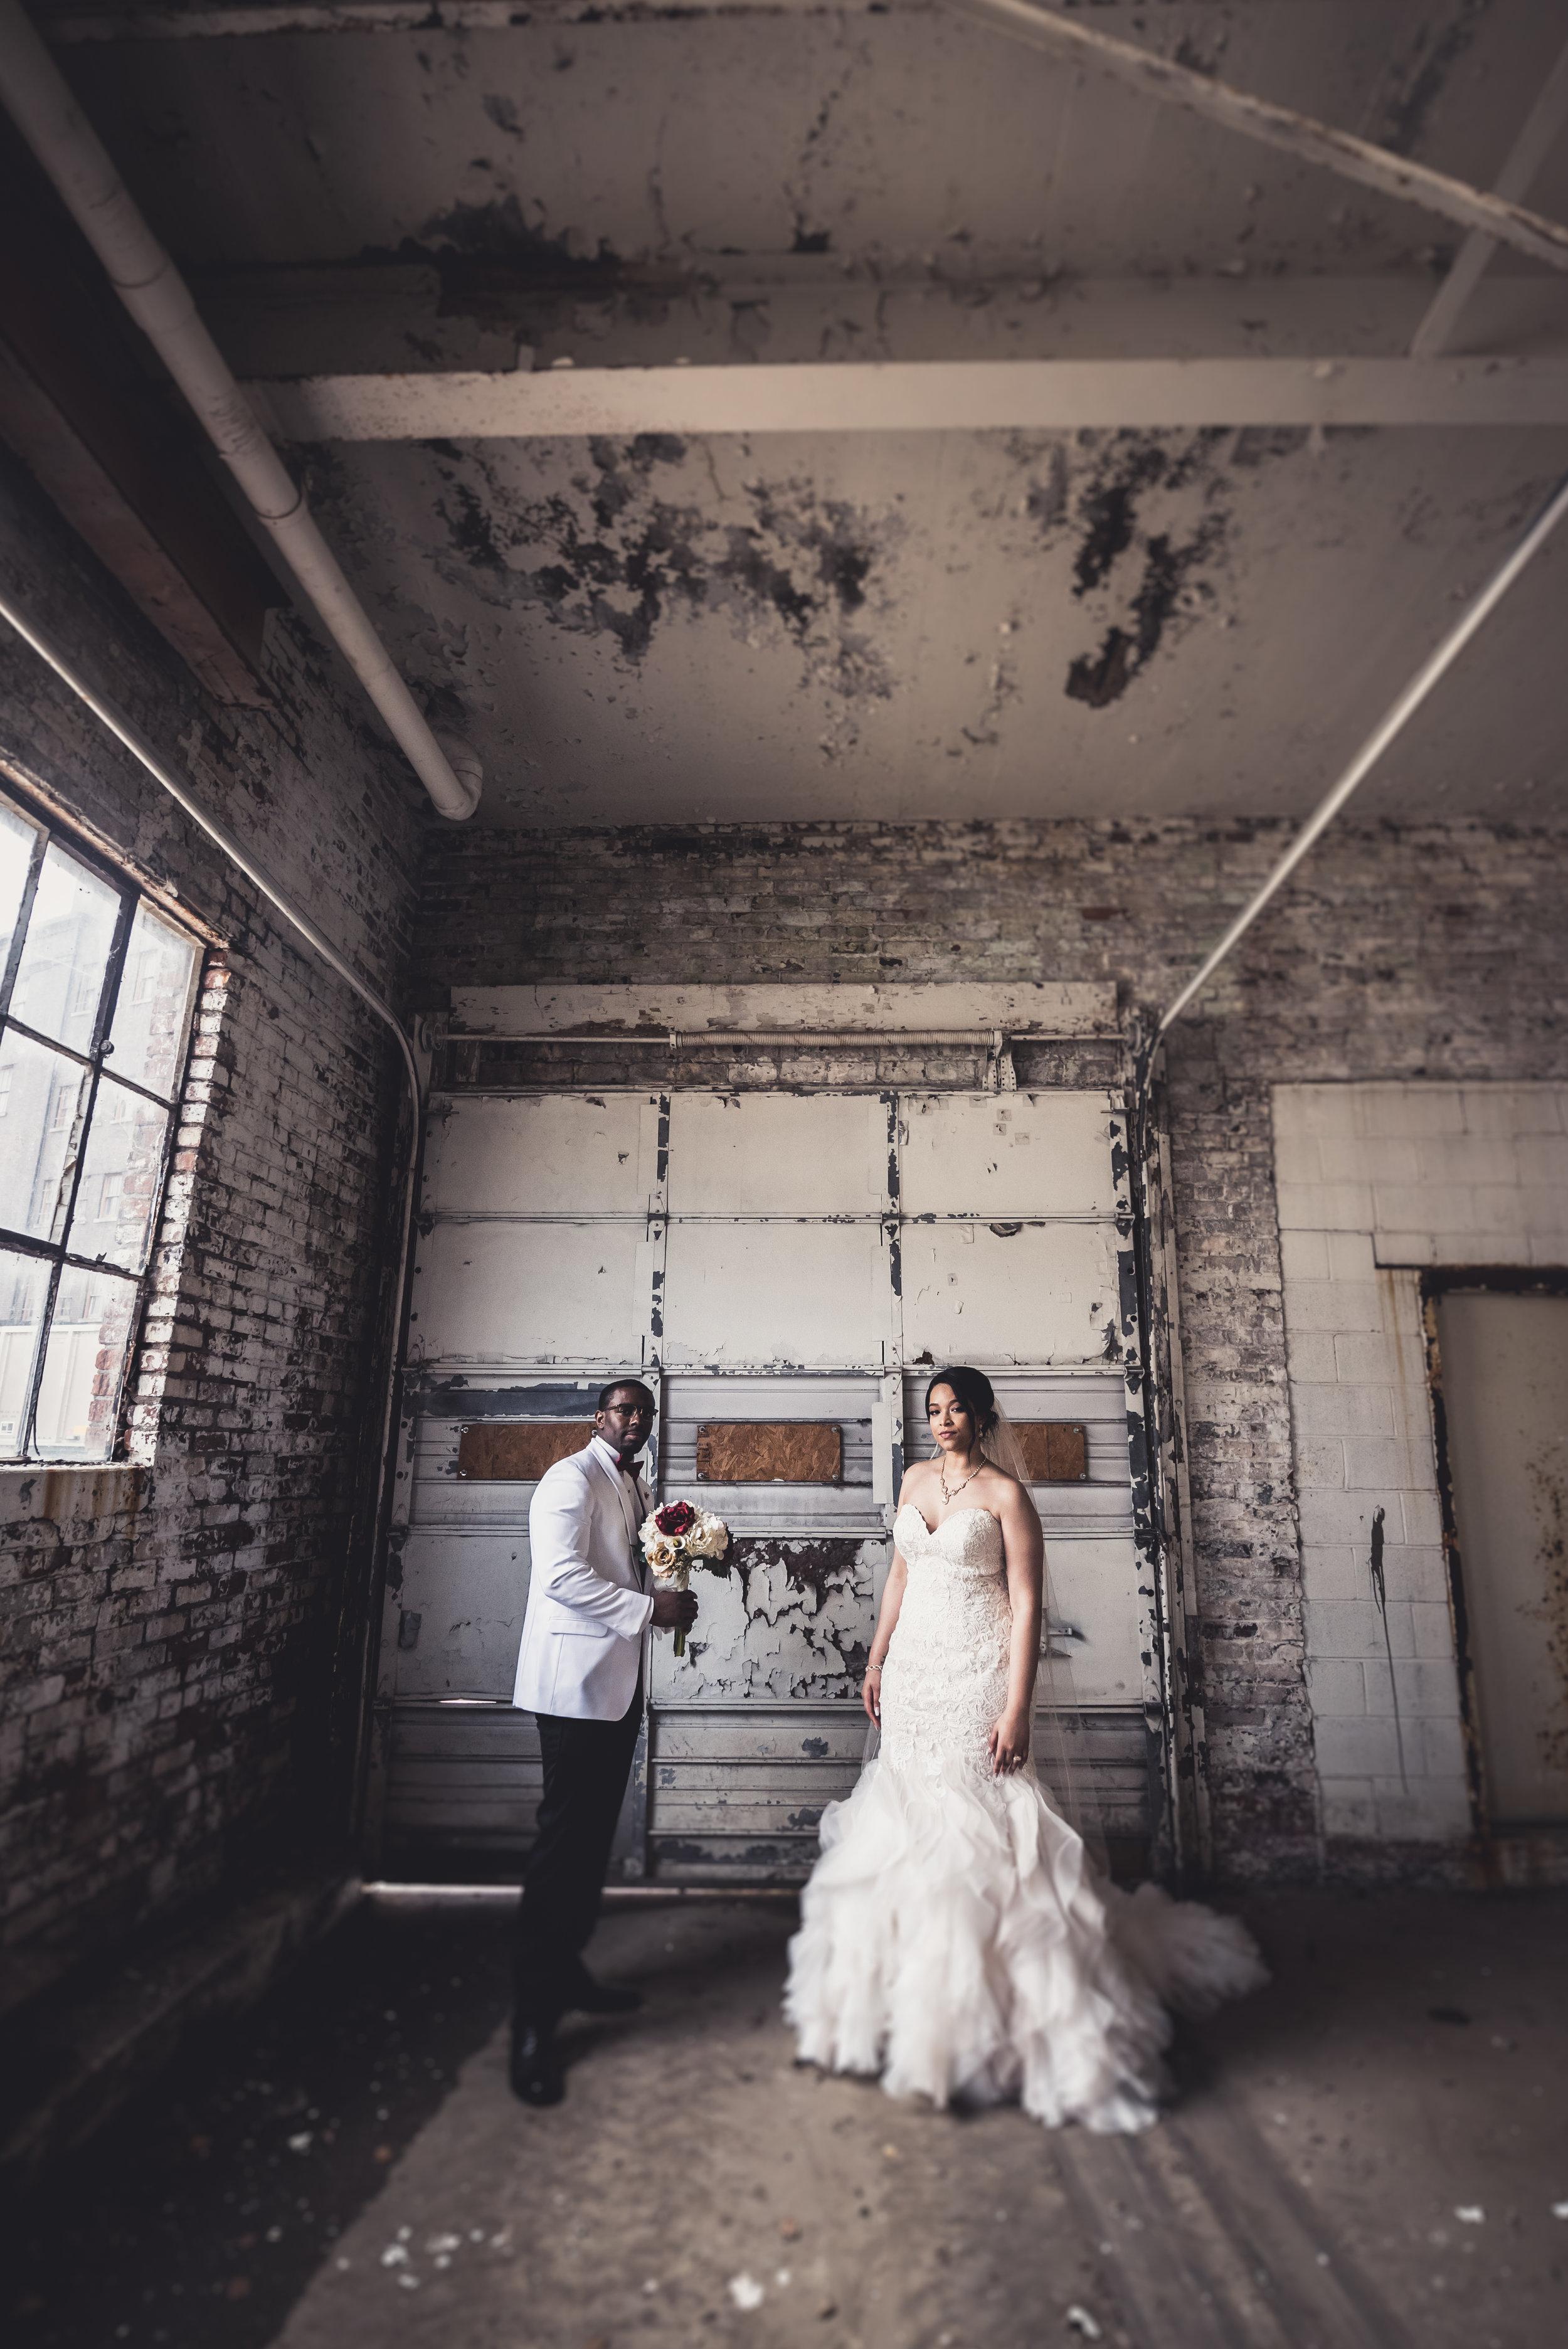 Burlington Iowa Wedding Midwest Photographer Melissa Cervantes _ Chantelle and Isaiah 320ll.jpg